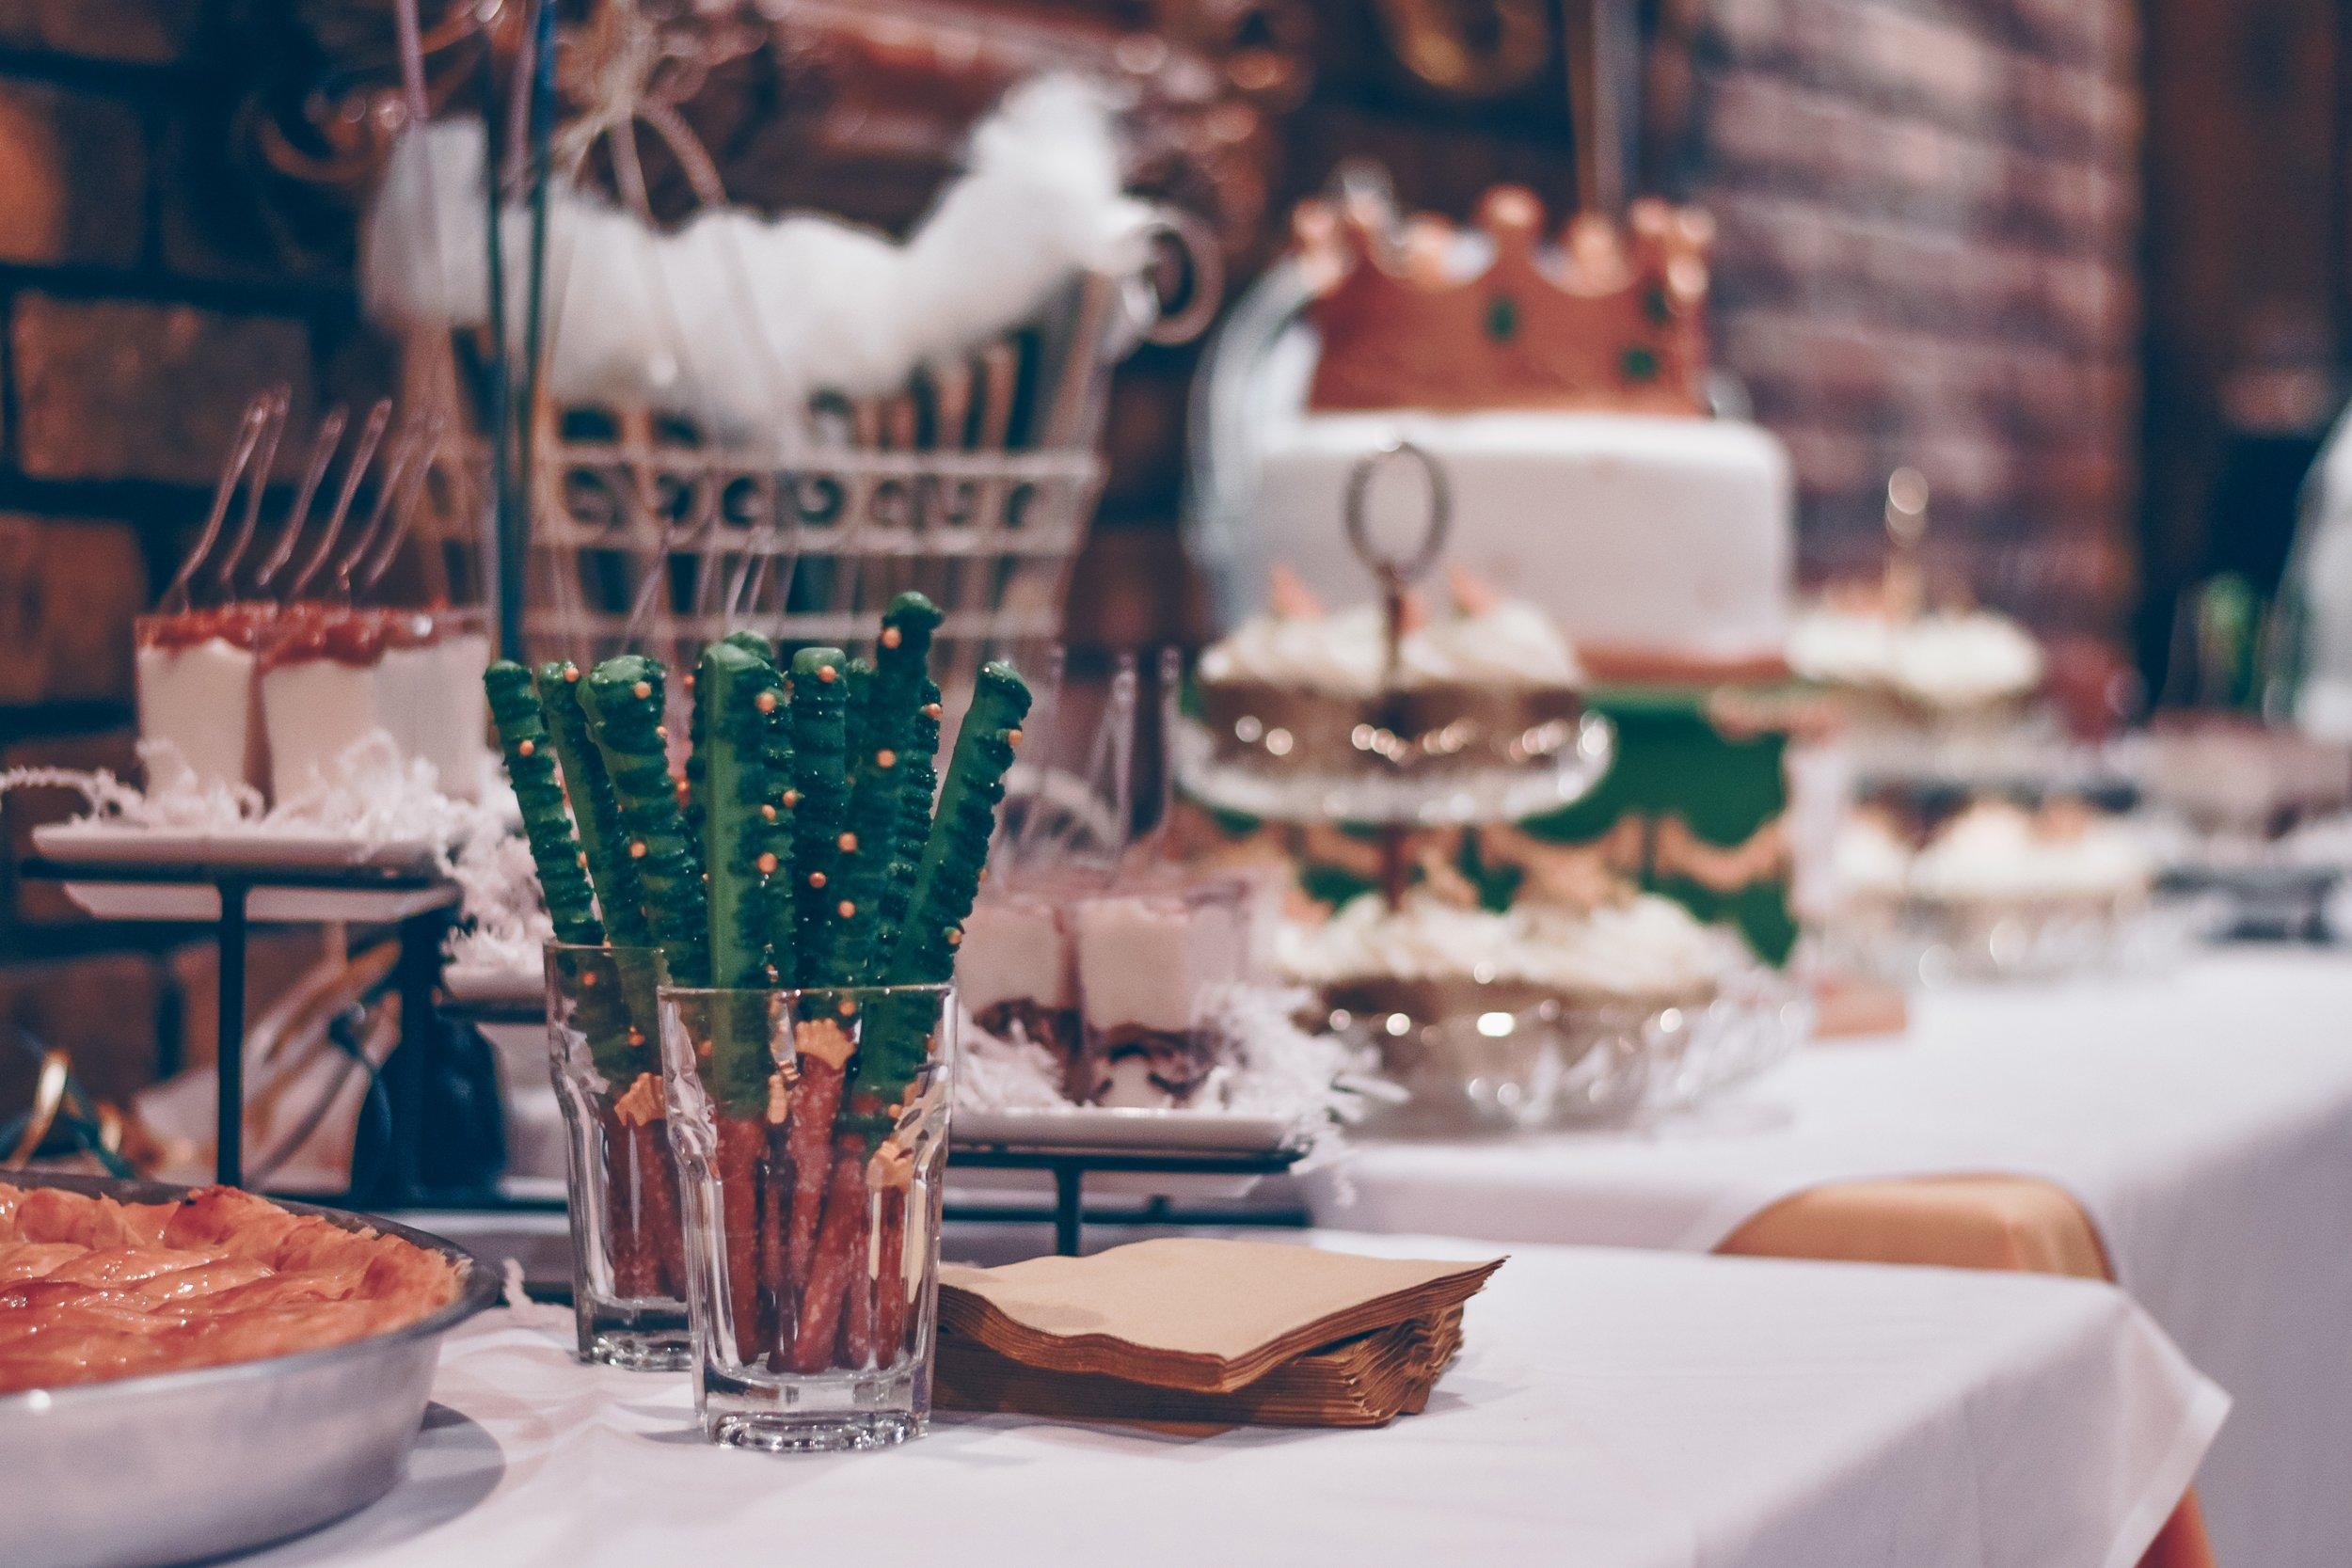 birthday-cake-blur-catering-903415.jpg